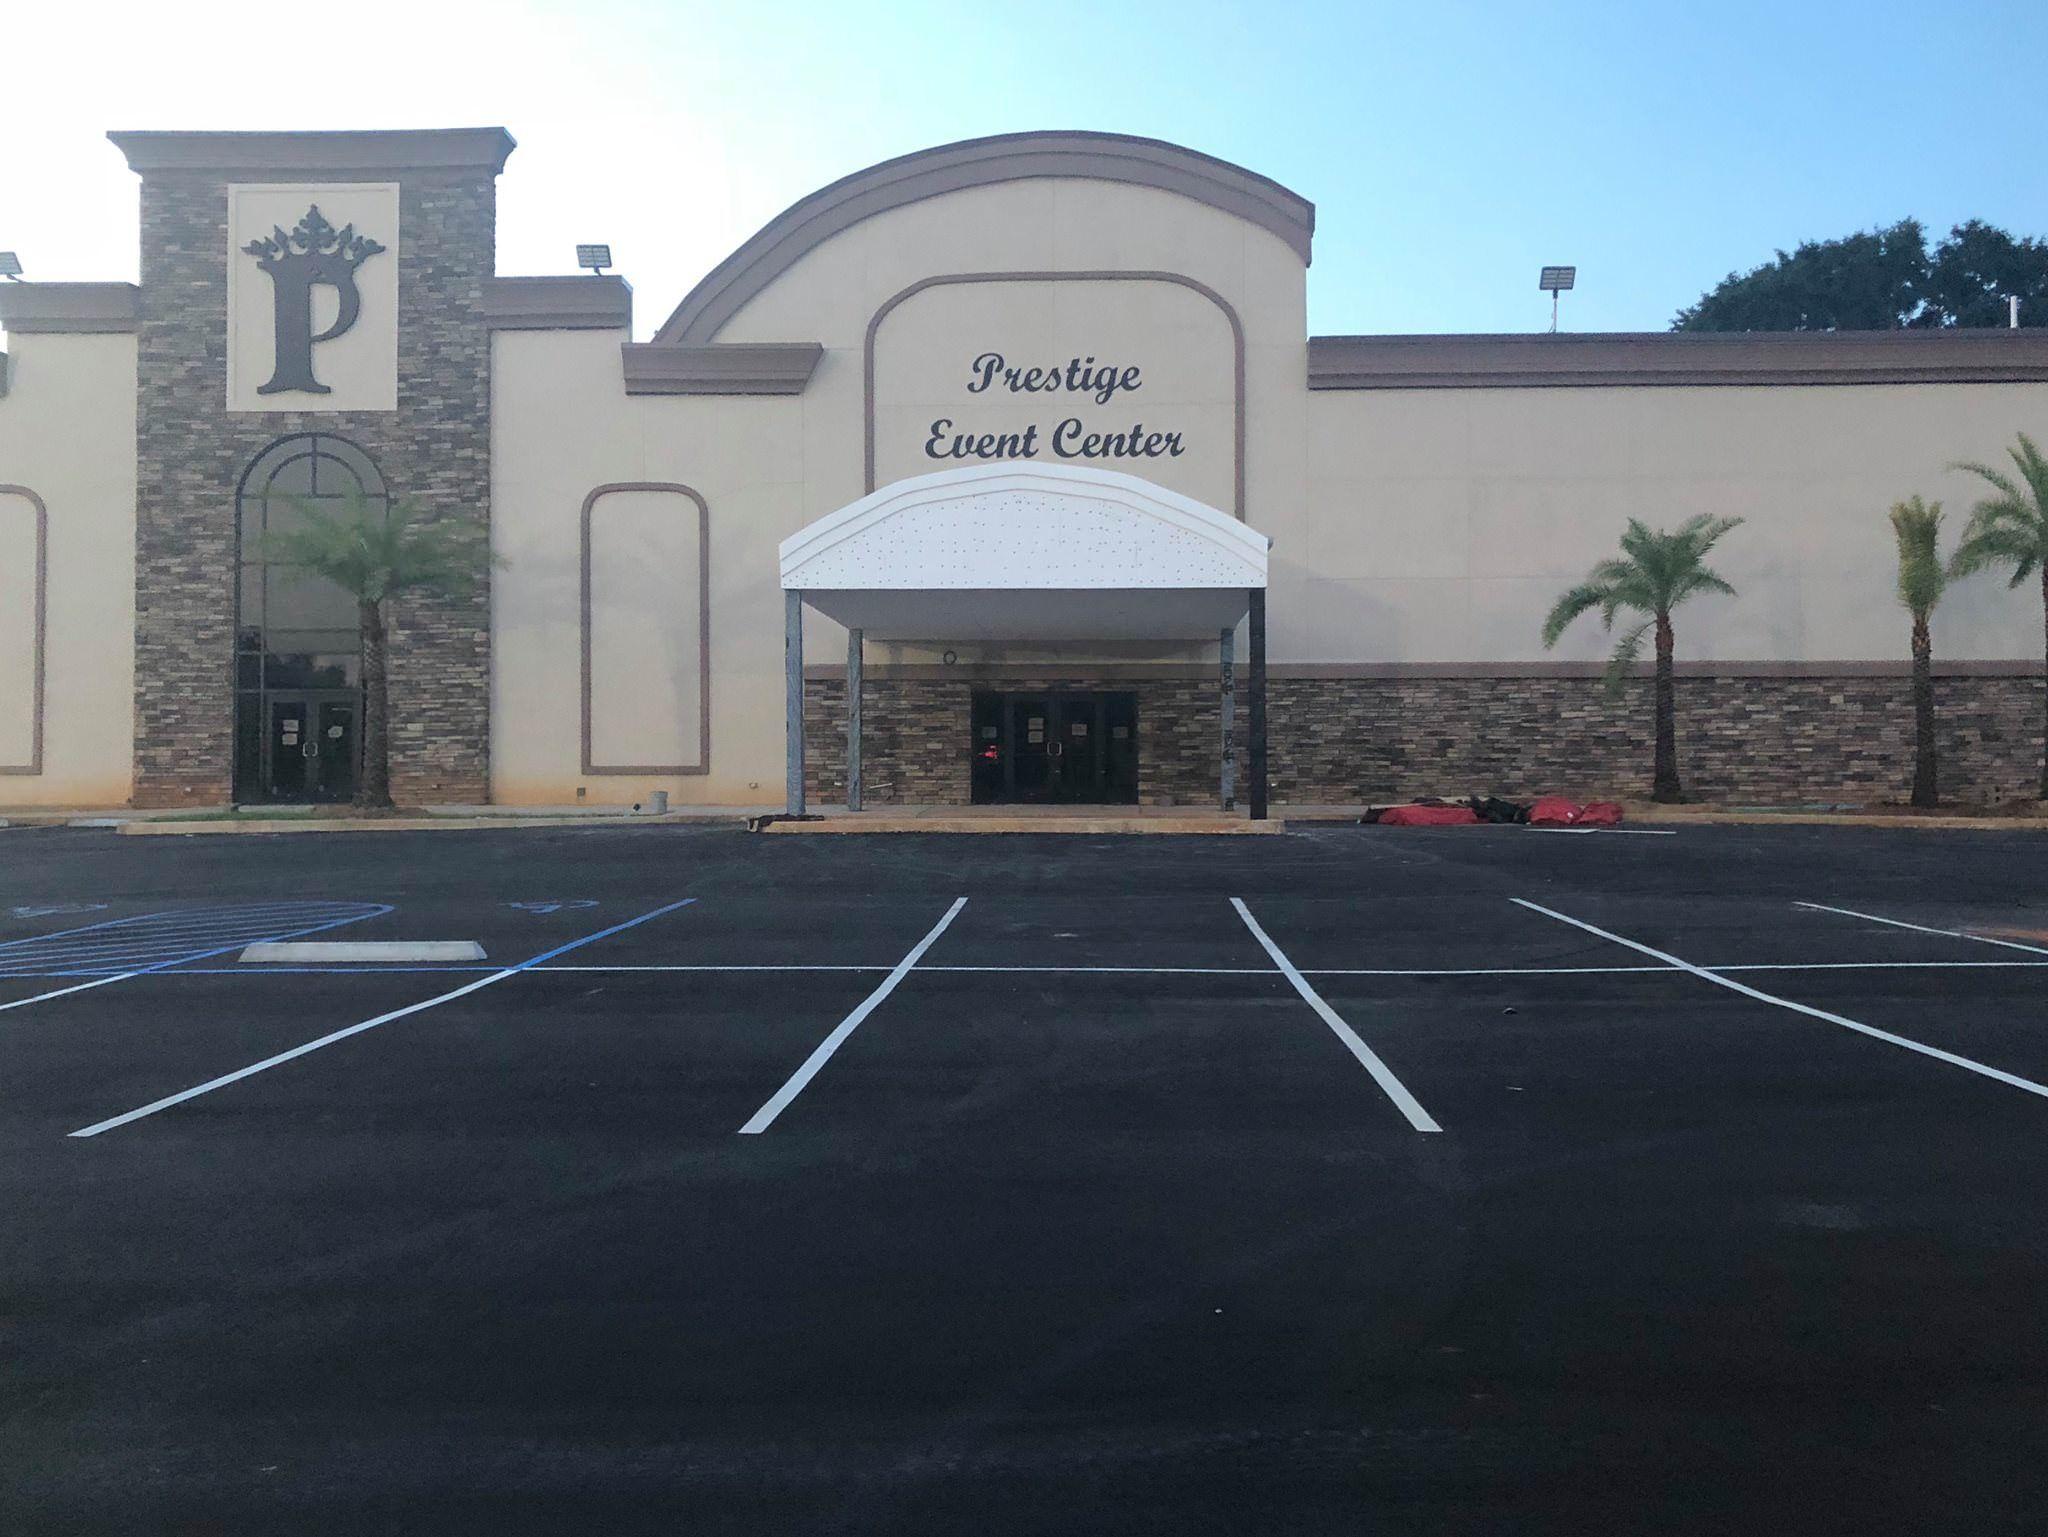 The Prestige event center located in Mobile, AL. We offer